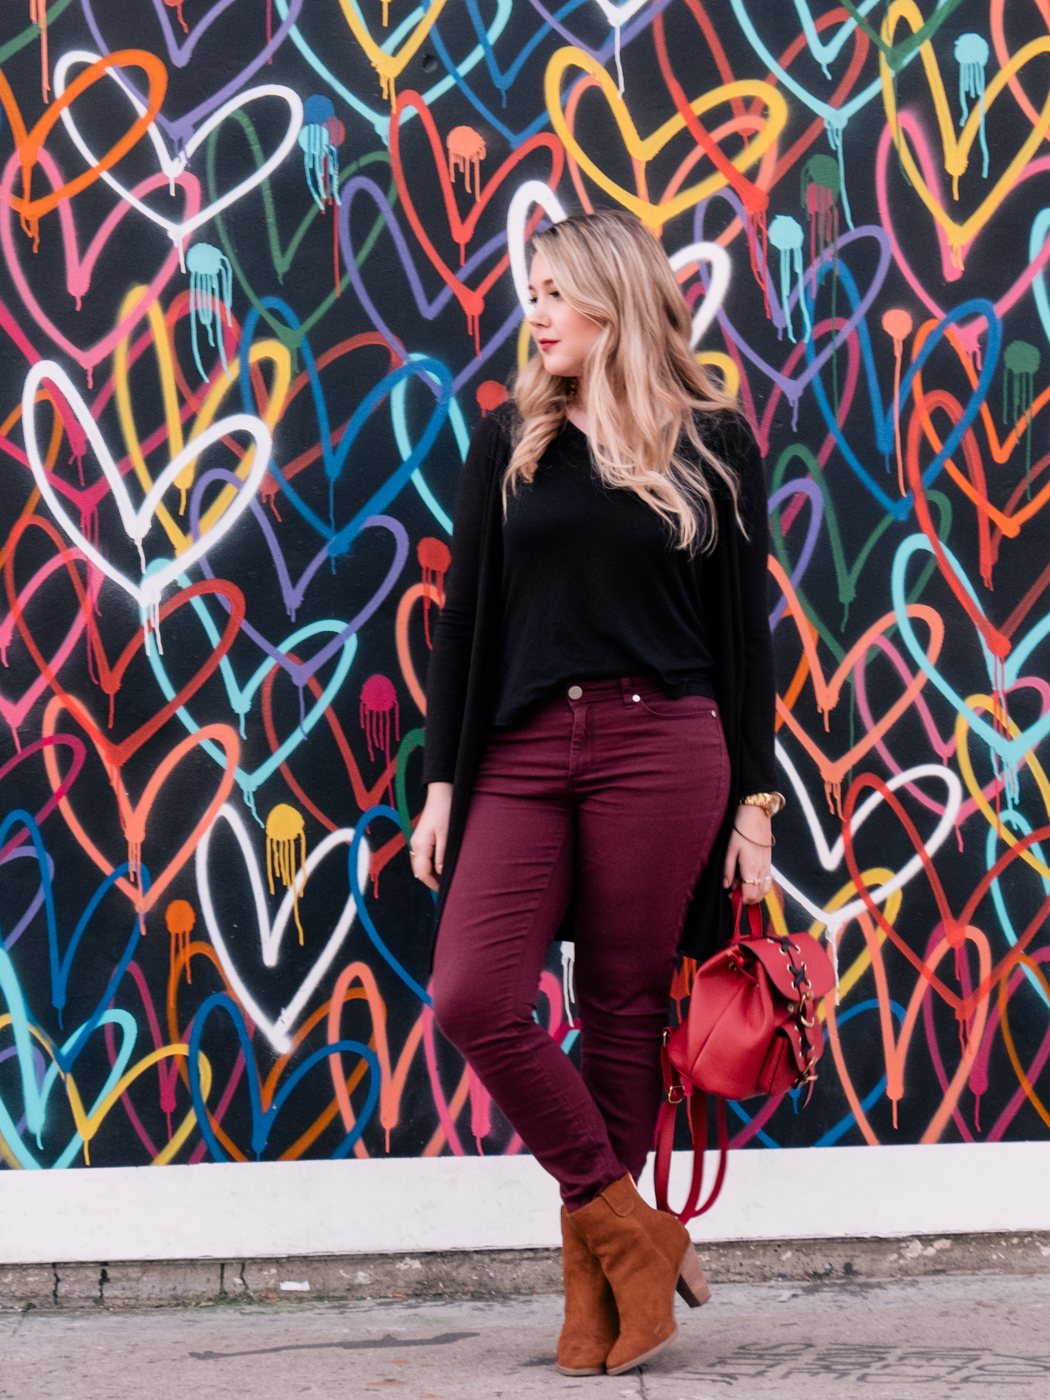 Debora Dahl, Love wall, Venice Beach, Red backpack